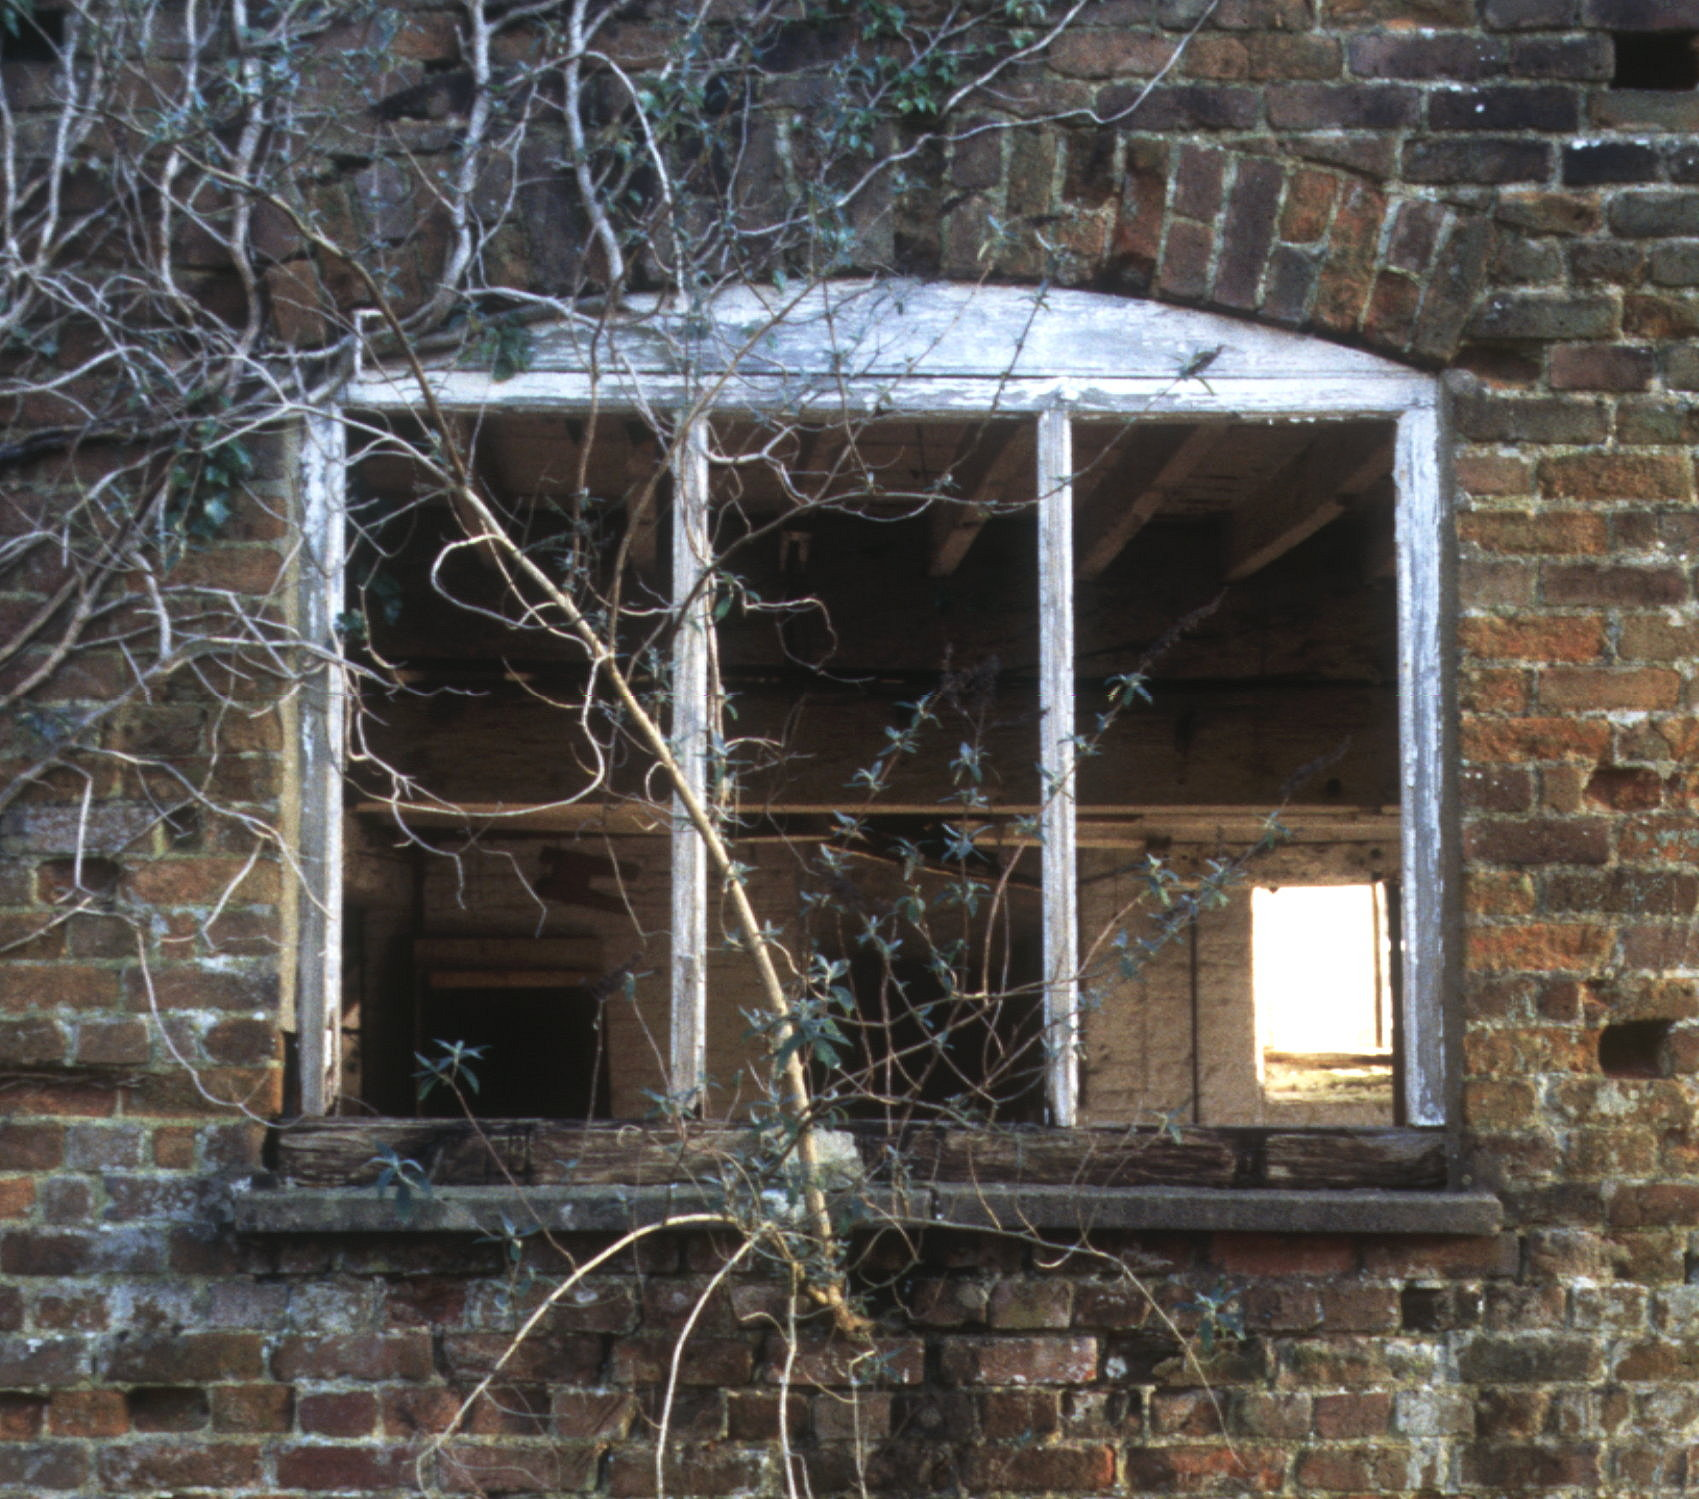 holcombe-mill-feb2000-window